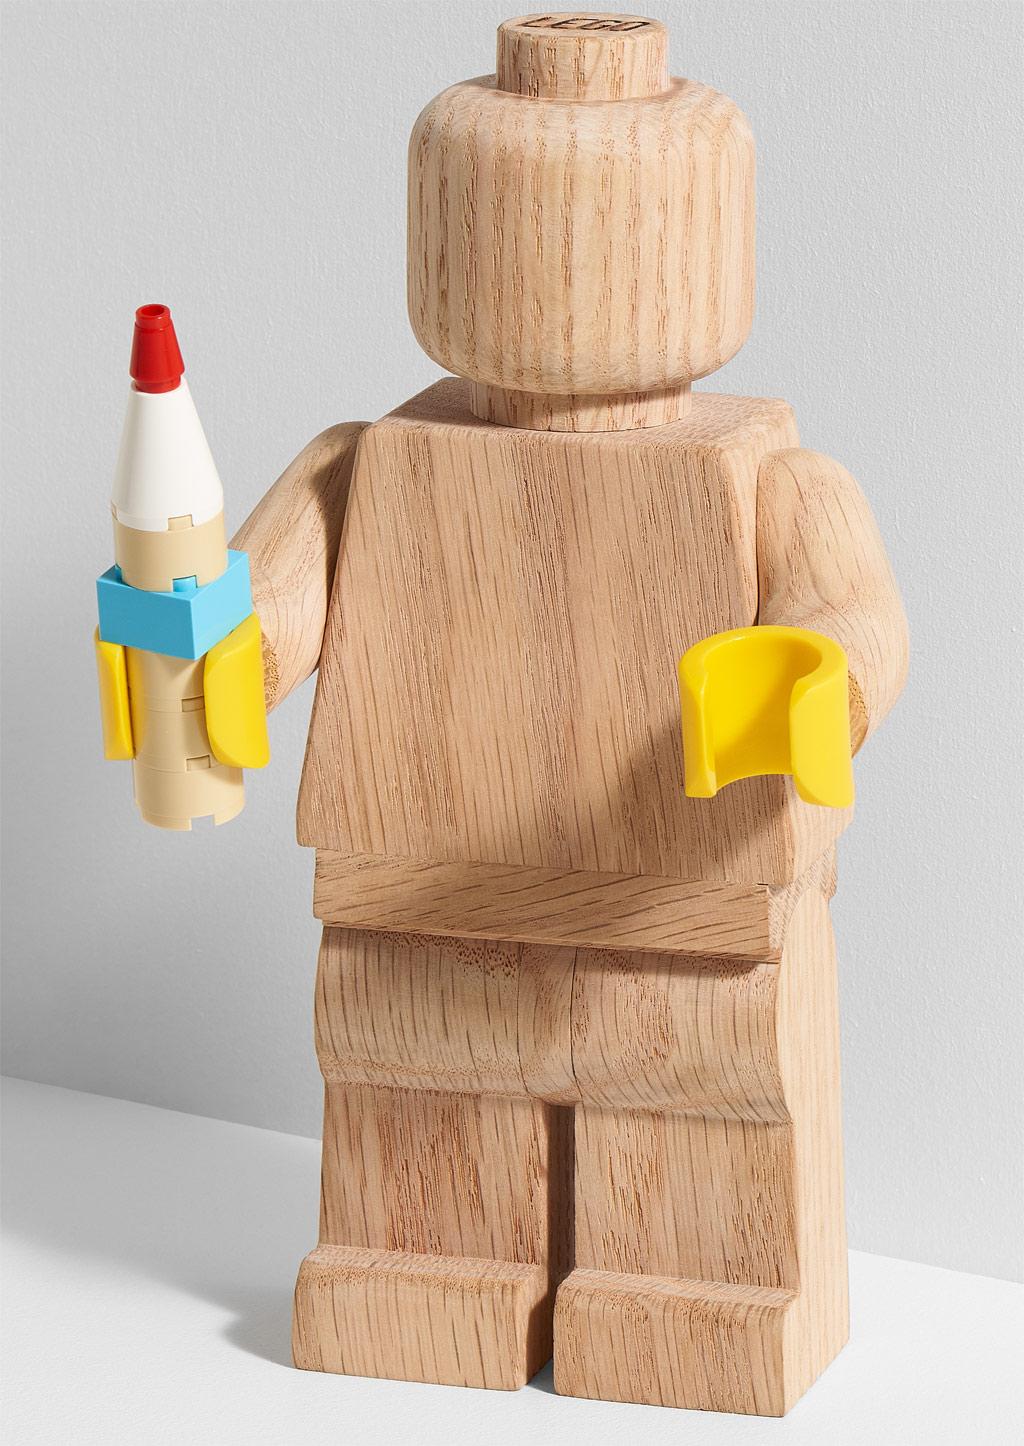 lego-originals-upscaled-wooden-minifigure-853967-2019-bleistifthalter zusammengebaut.com